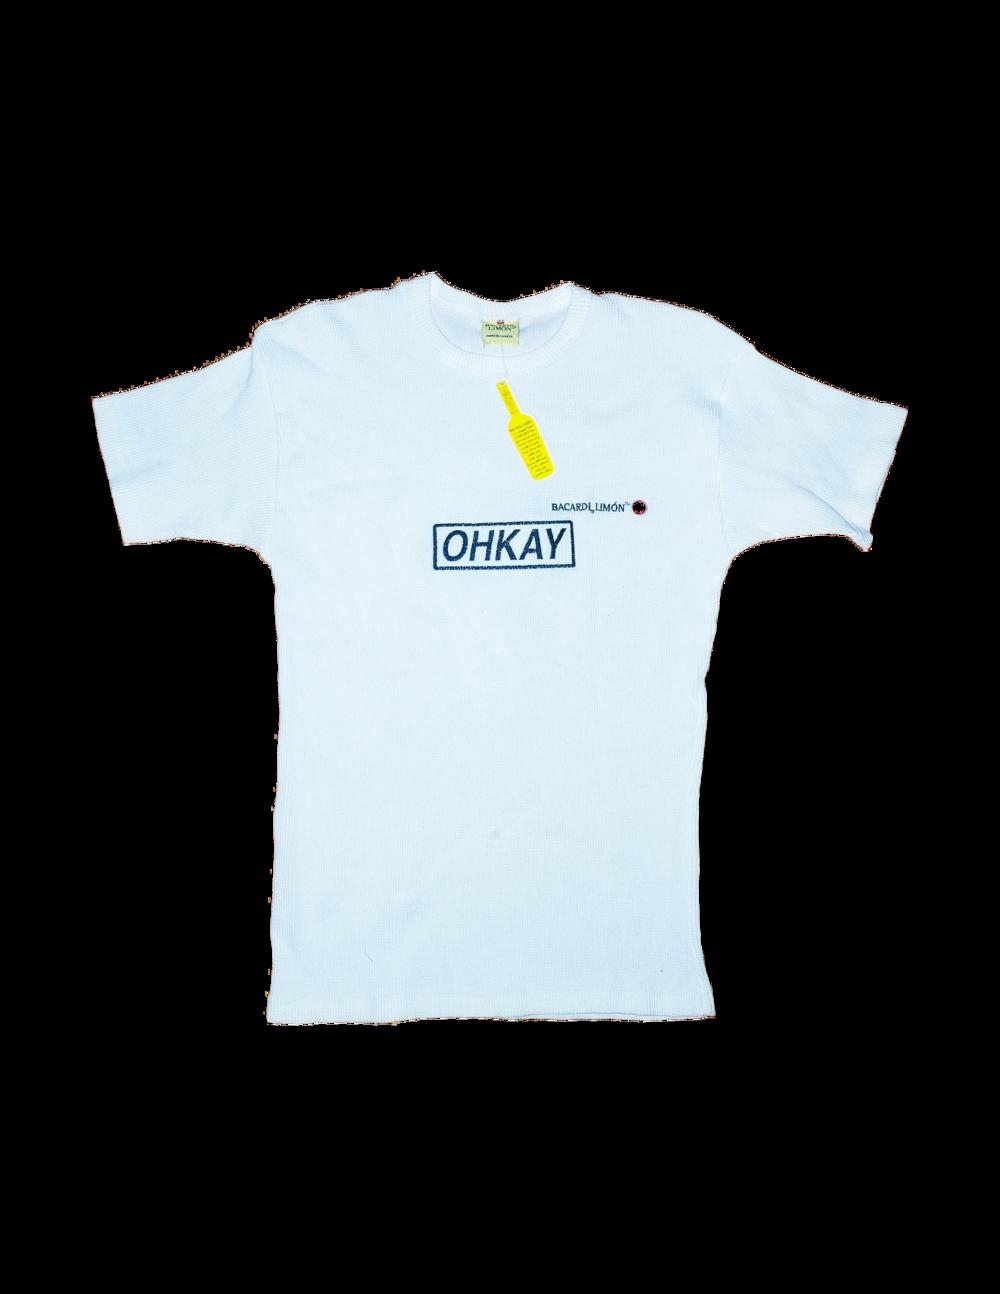 bicardi shirt.png